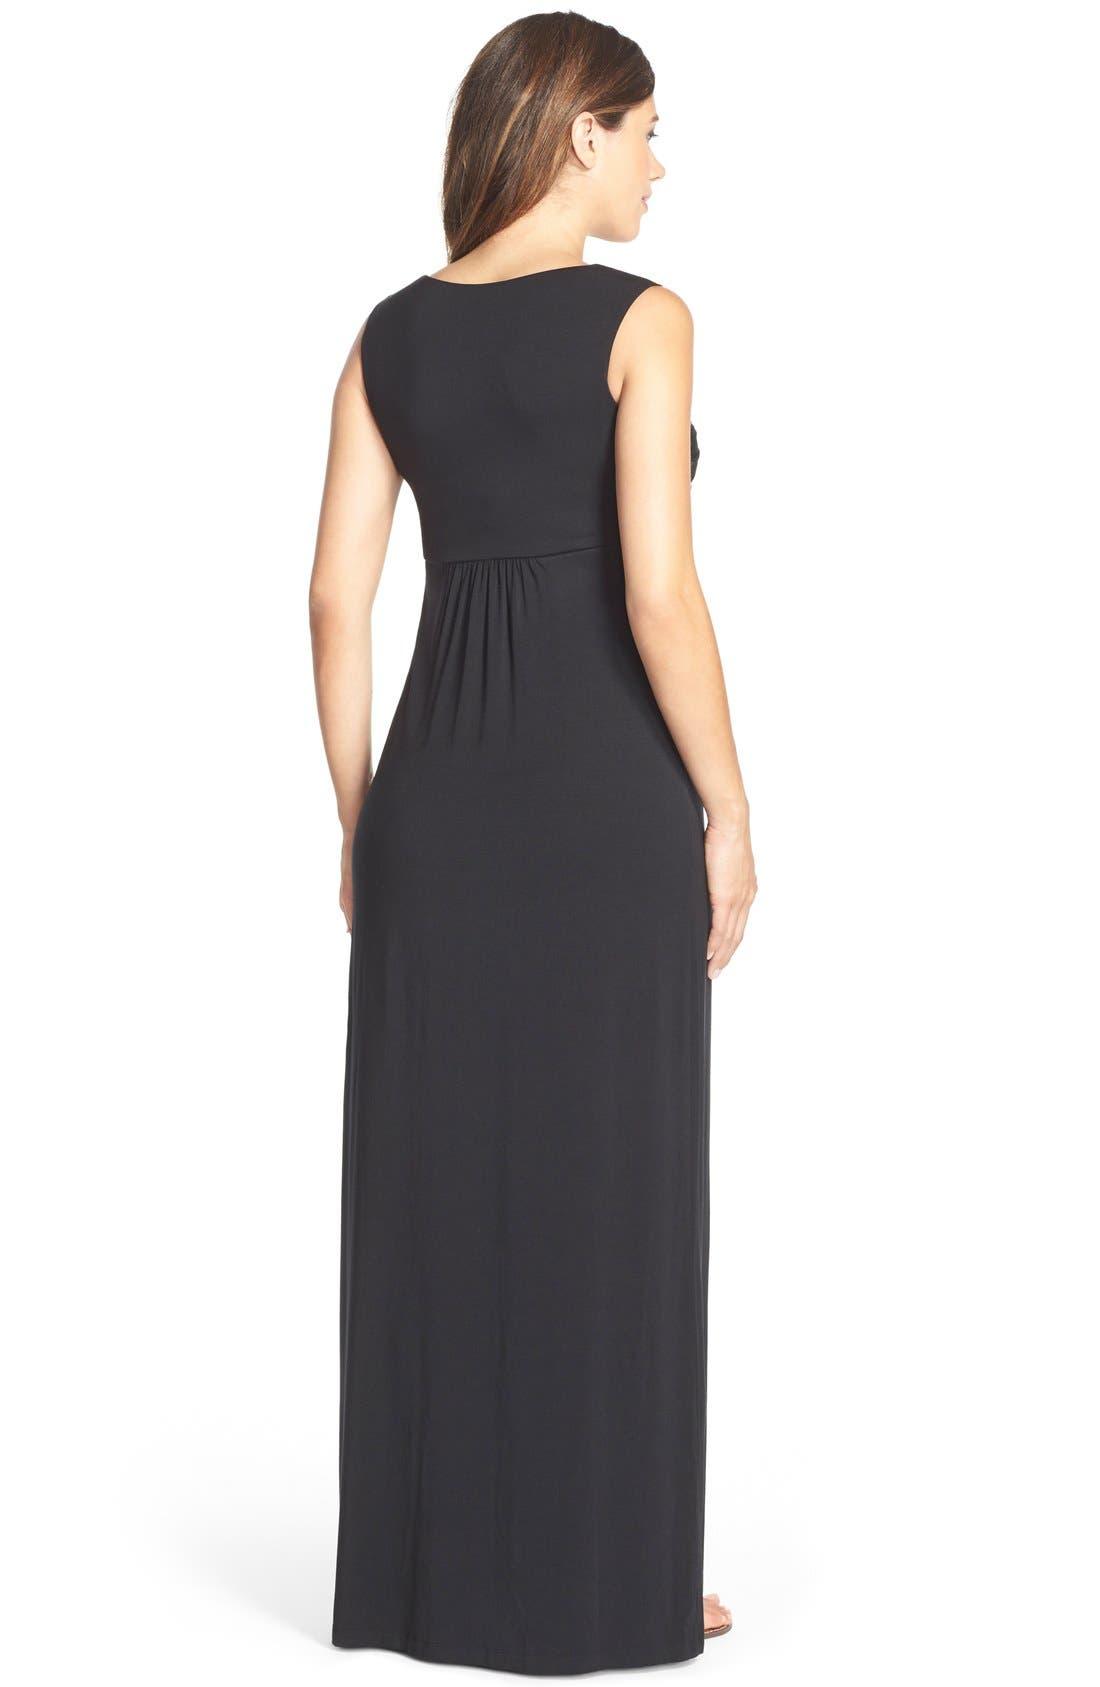 TART MATERNITY, 'Callie' Jersey Maxi Maternity Dress, Alternate thumbnail 5, color, BLACK